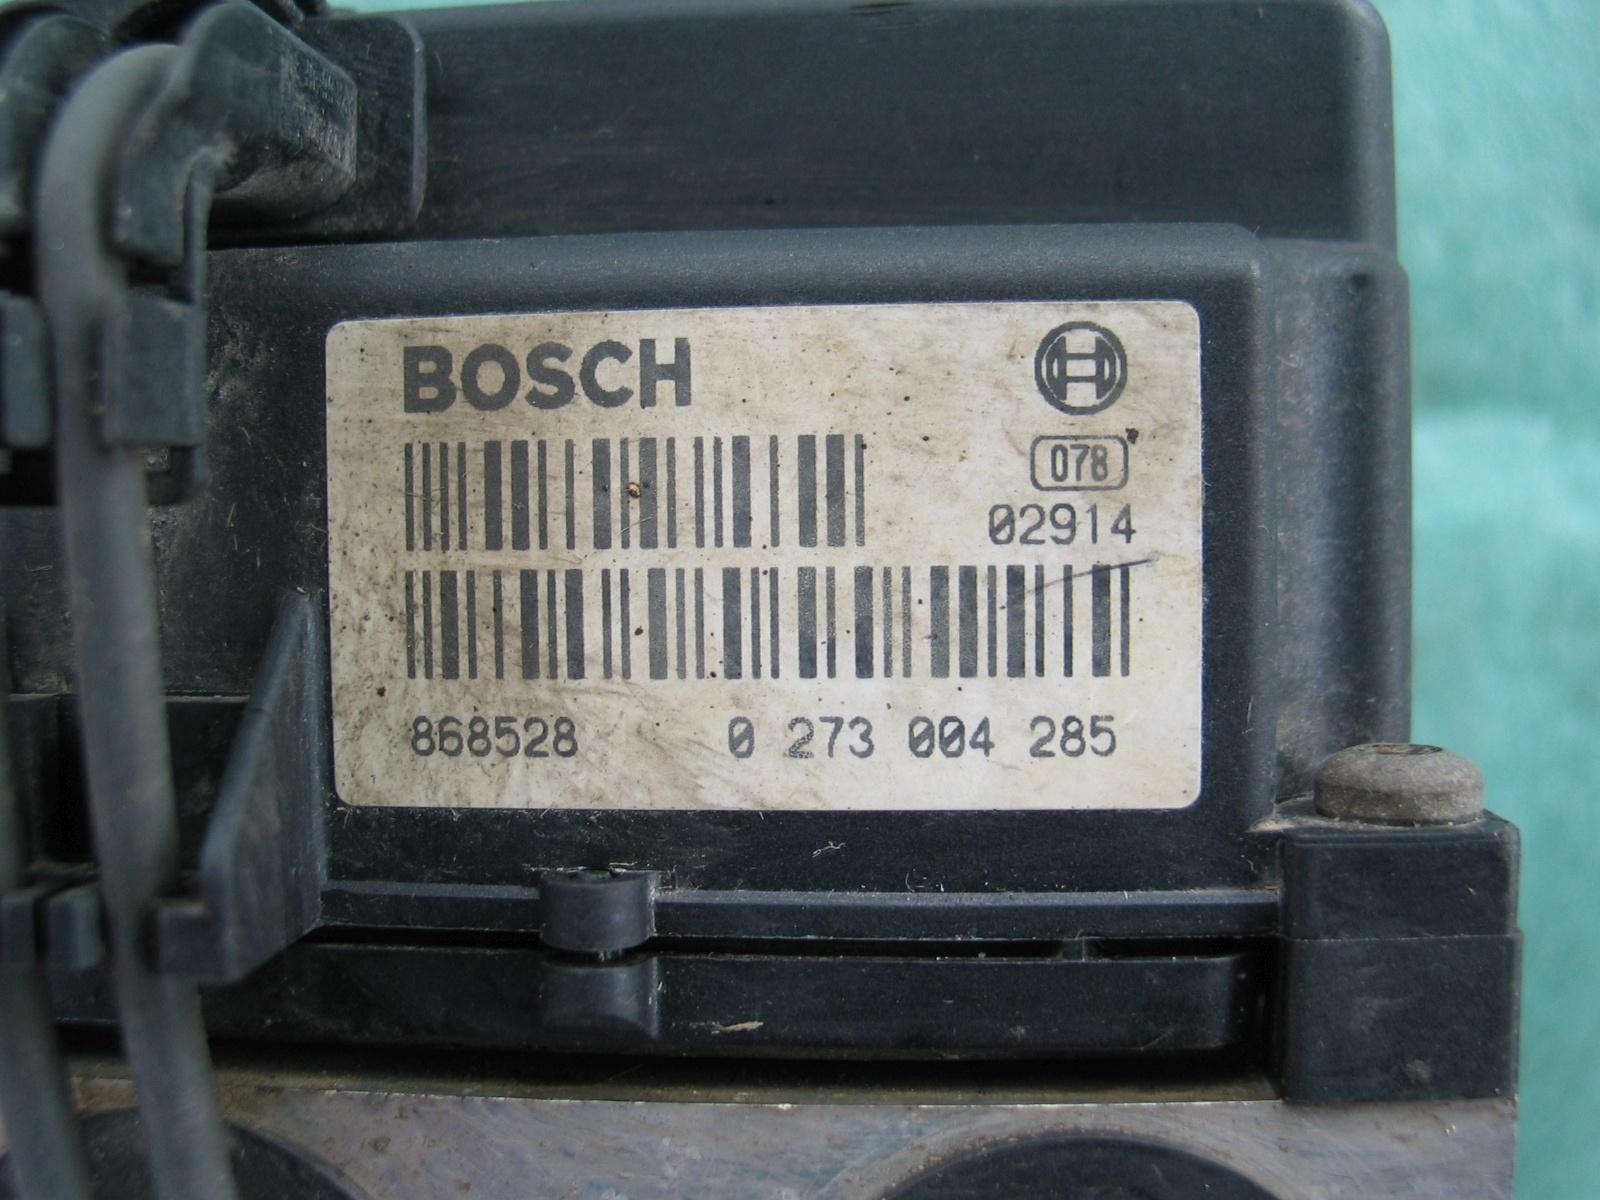 ABS Steuergerät Audi A4 0265220411 8E0614111C 0273004285